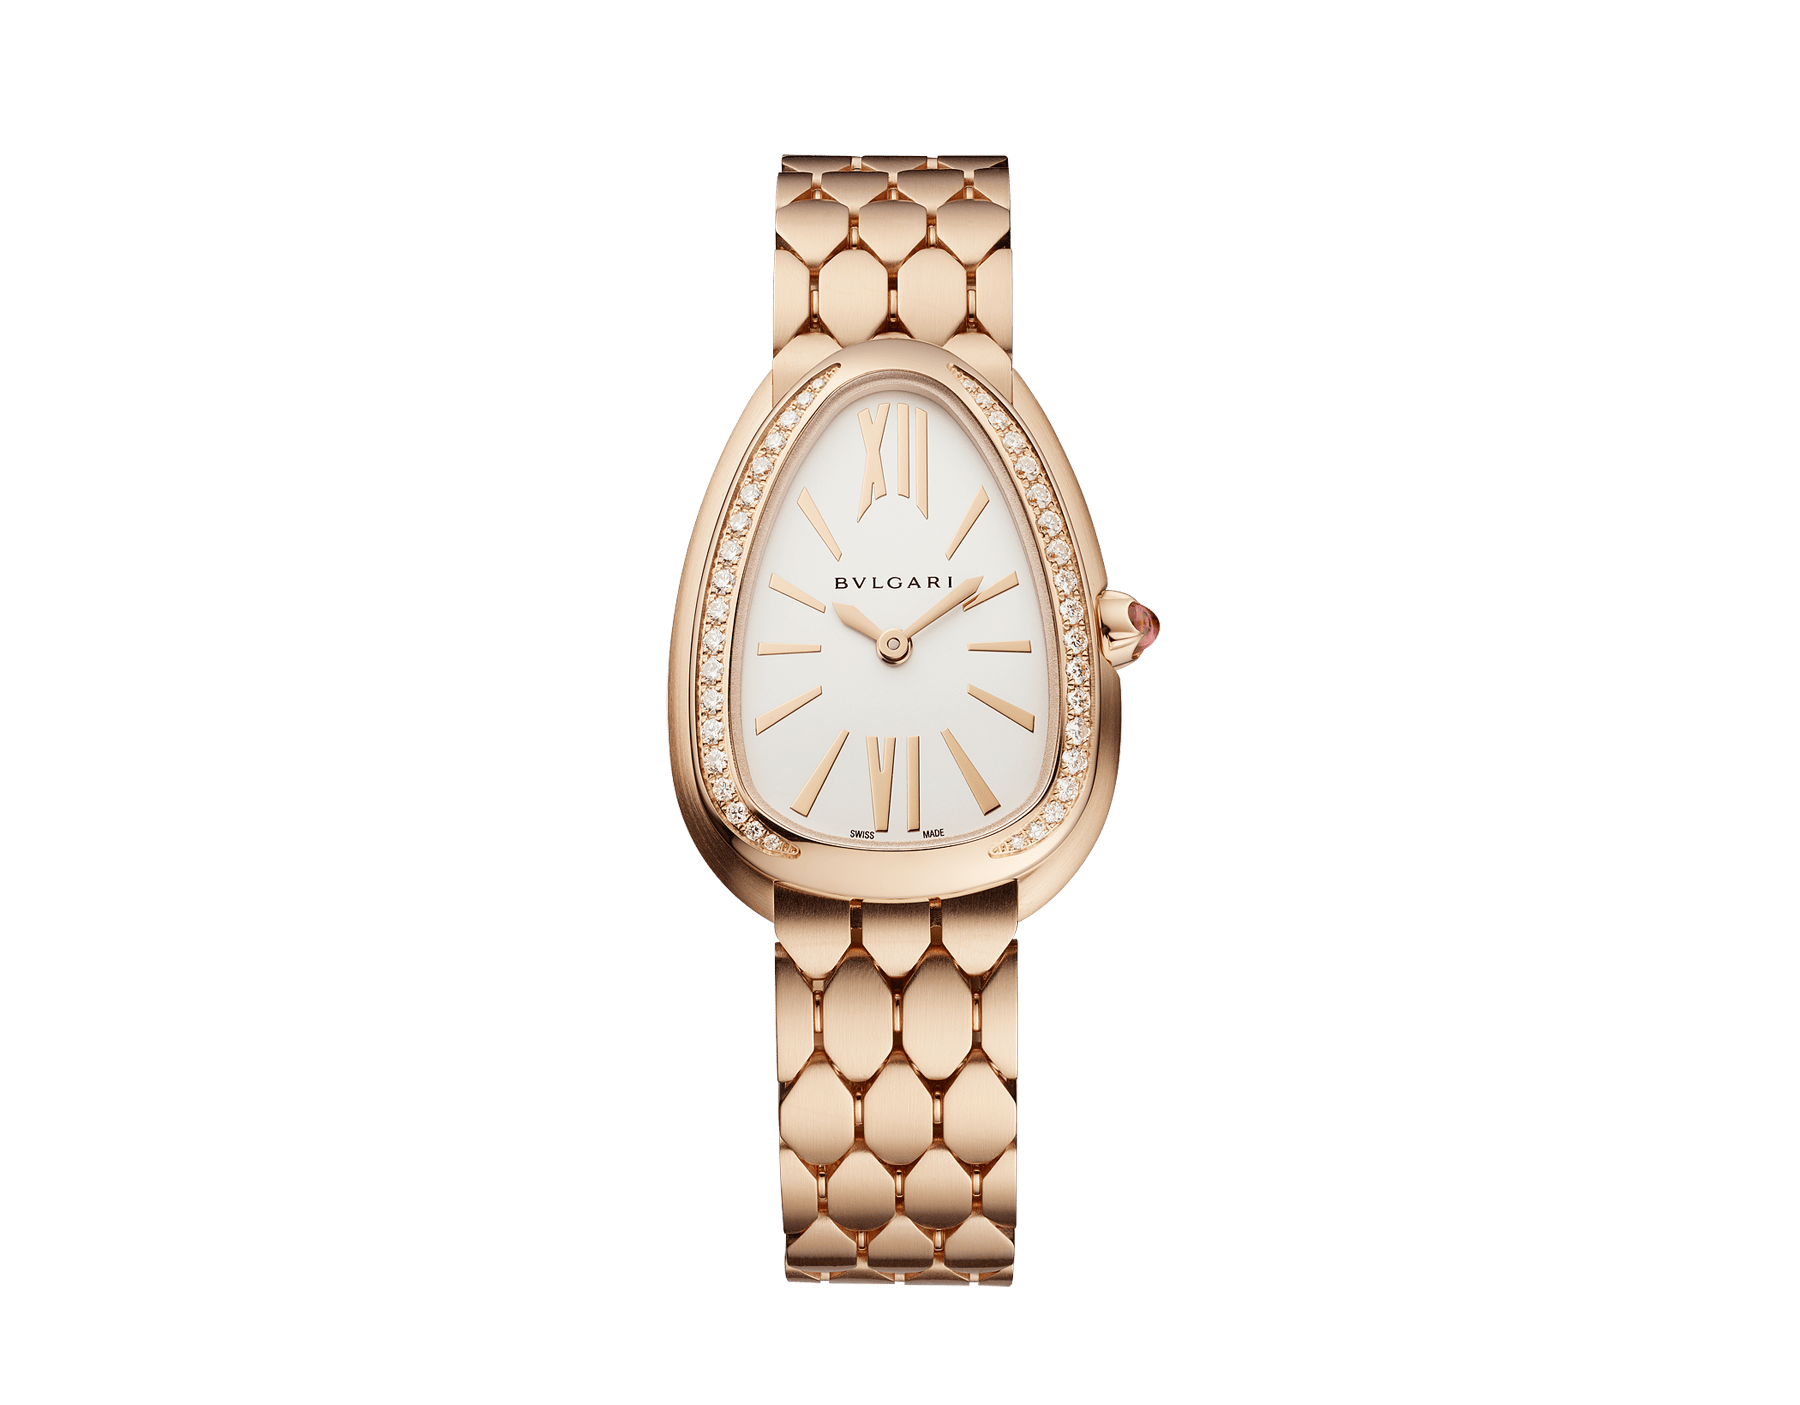 Serpenti Seduttori 腕錶,18K 玫瑰金錶殼和錶圈鑲飾鑽石,銀白色蛋白石錶盤,18K 玫瑰金髮絲紋錶帶。 103169 image 1